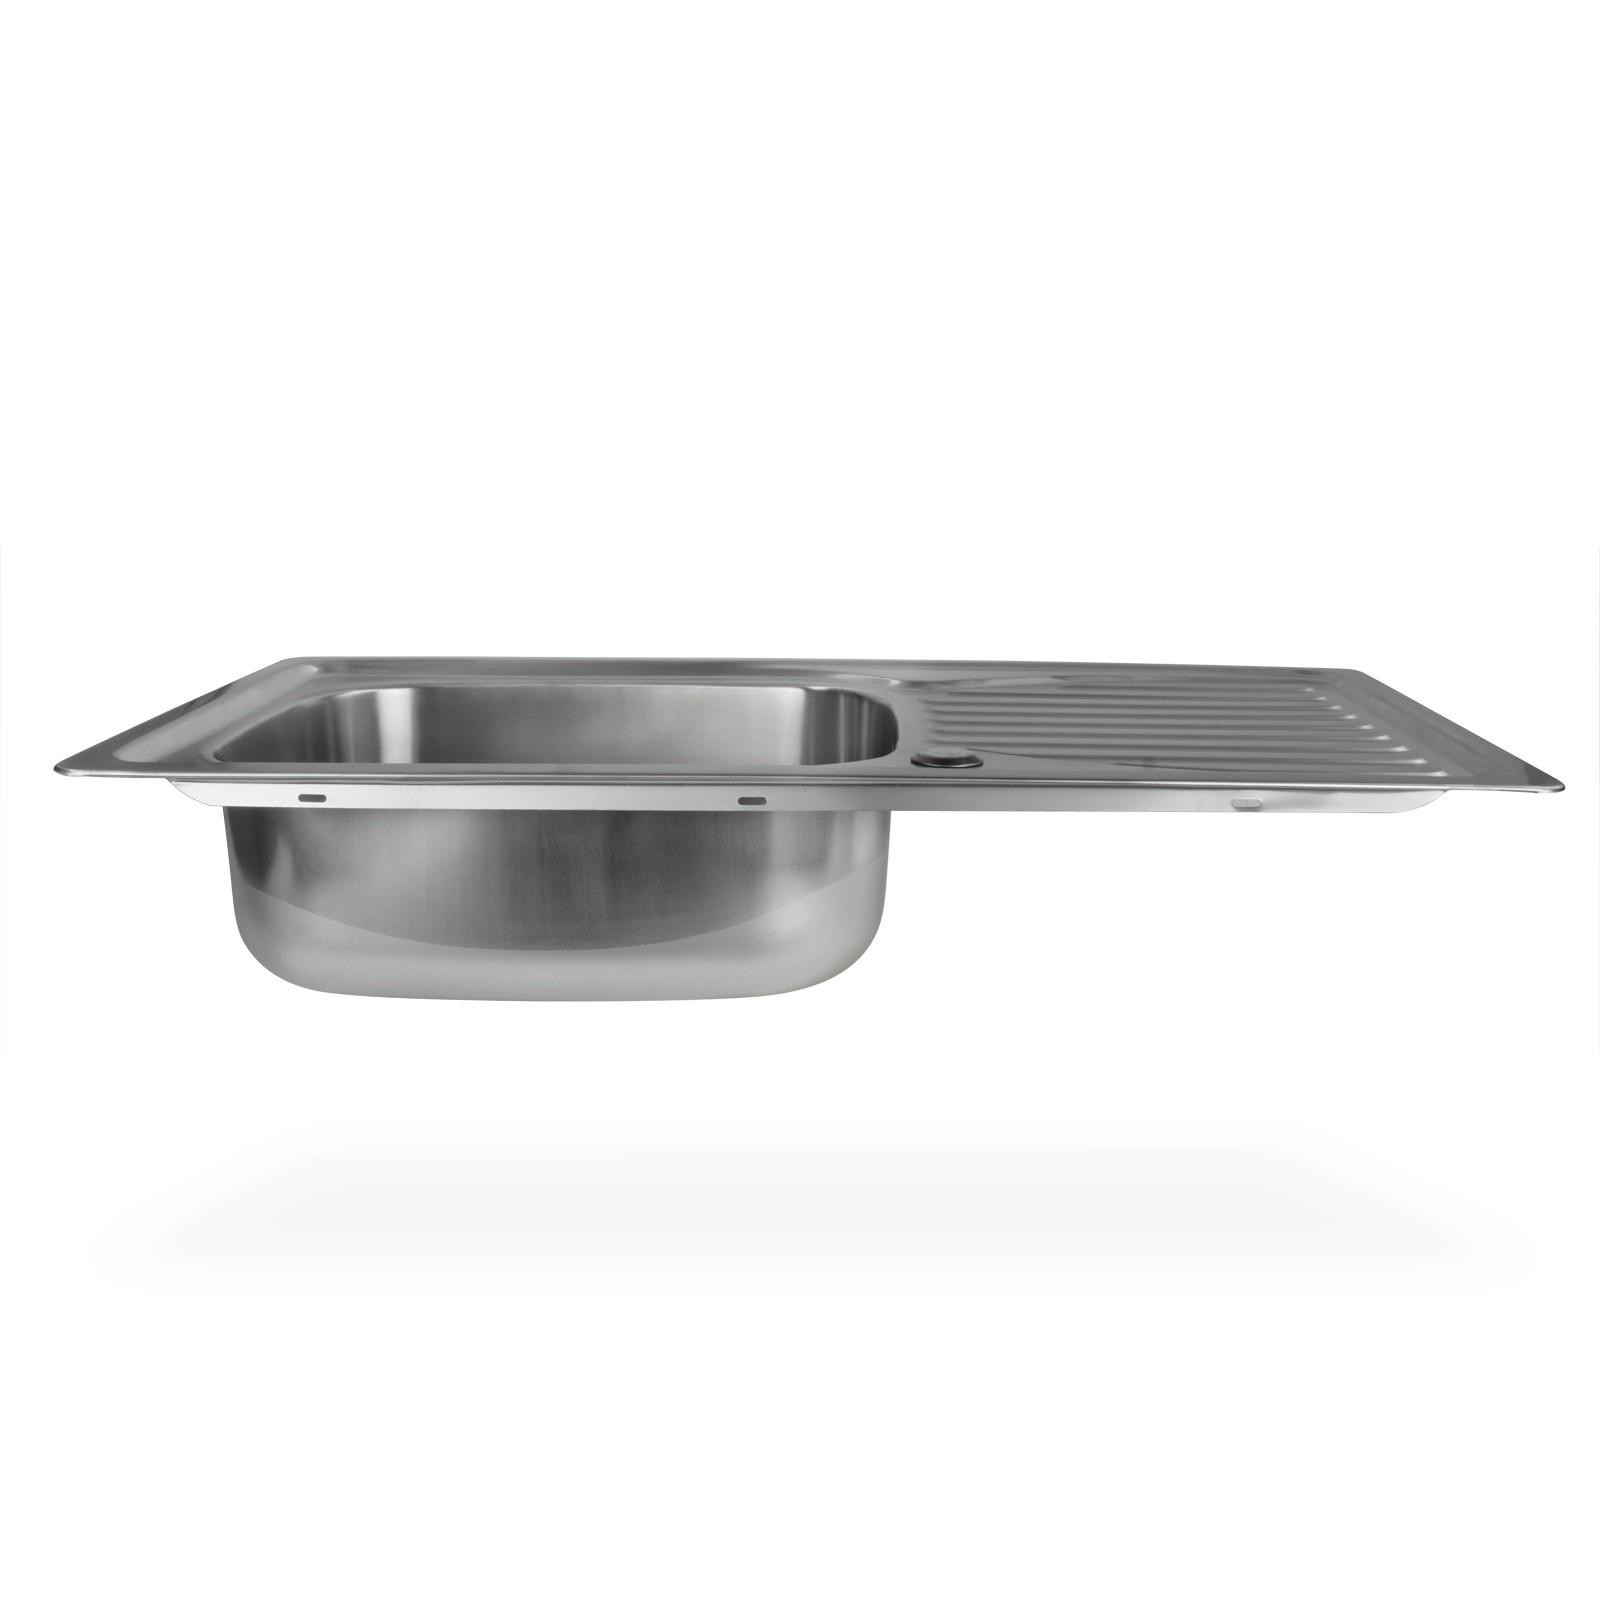 Edelstahl einbausp le hemeral waschbecken links rechteckig for Waschbecken edelstahl